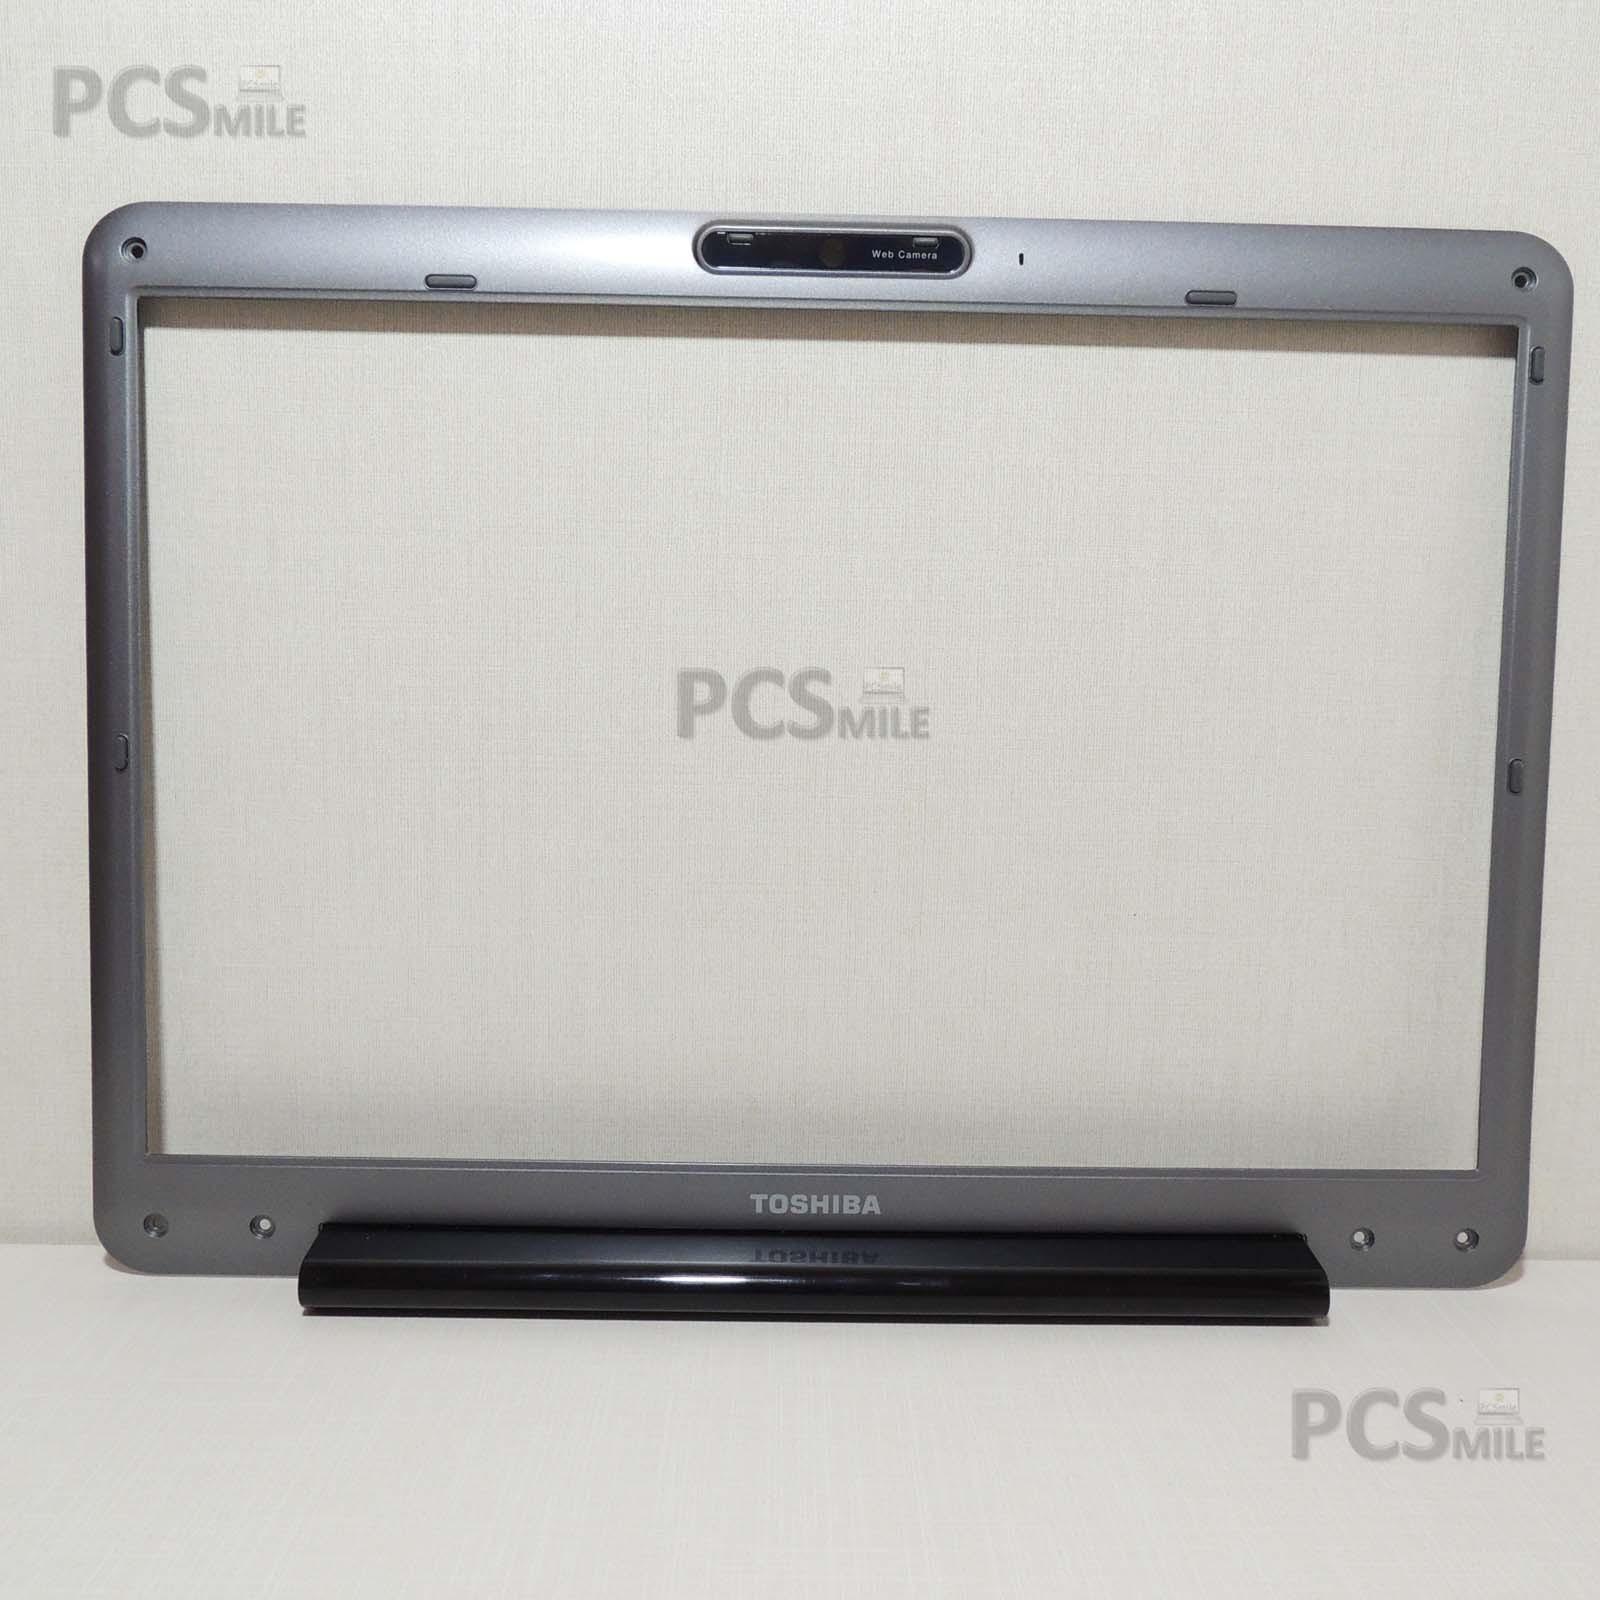 Scocca frame LCD cornice schermo Toshiba Satellite A300 B0249002S1018903G